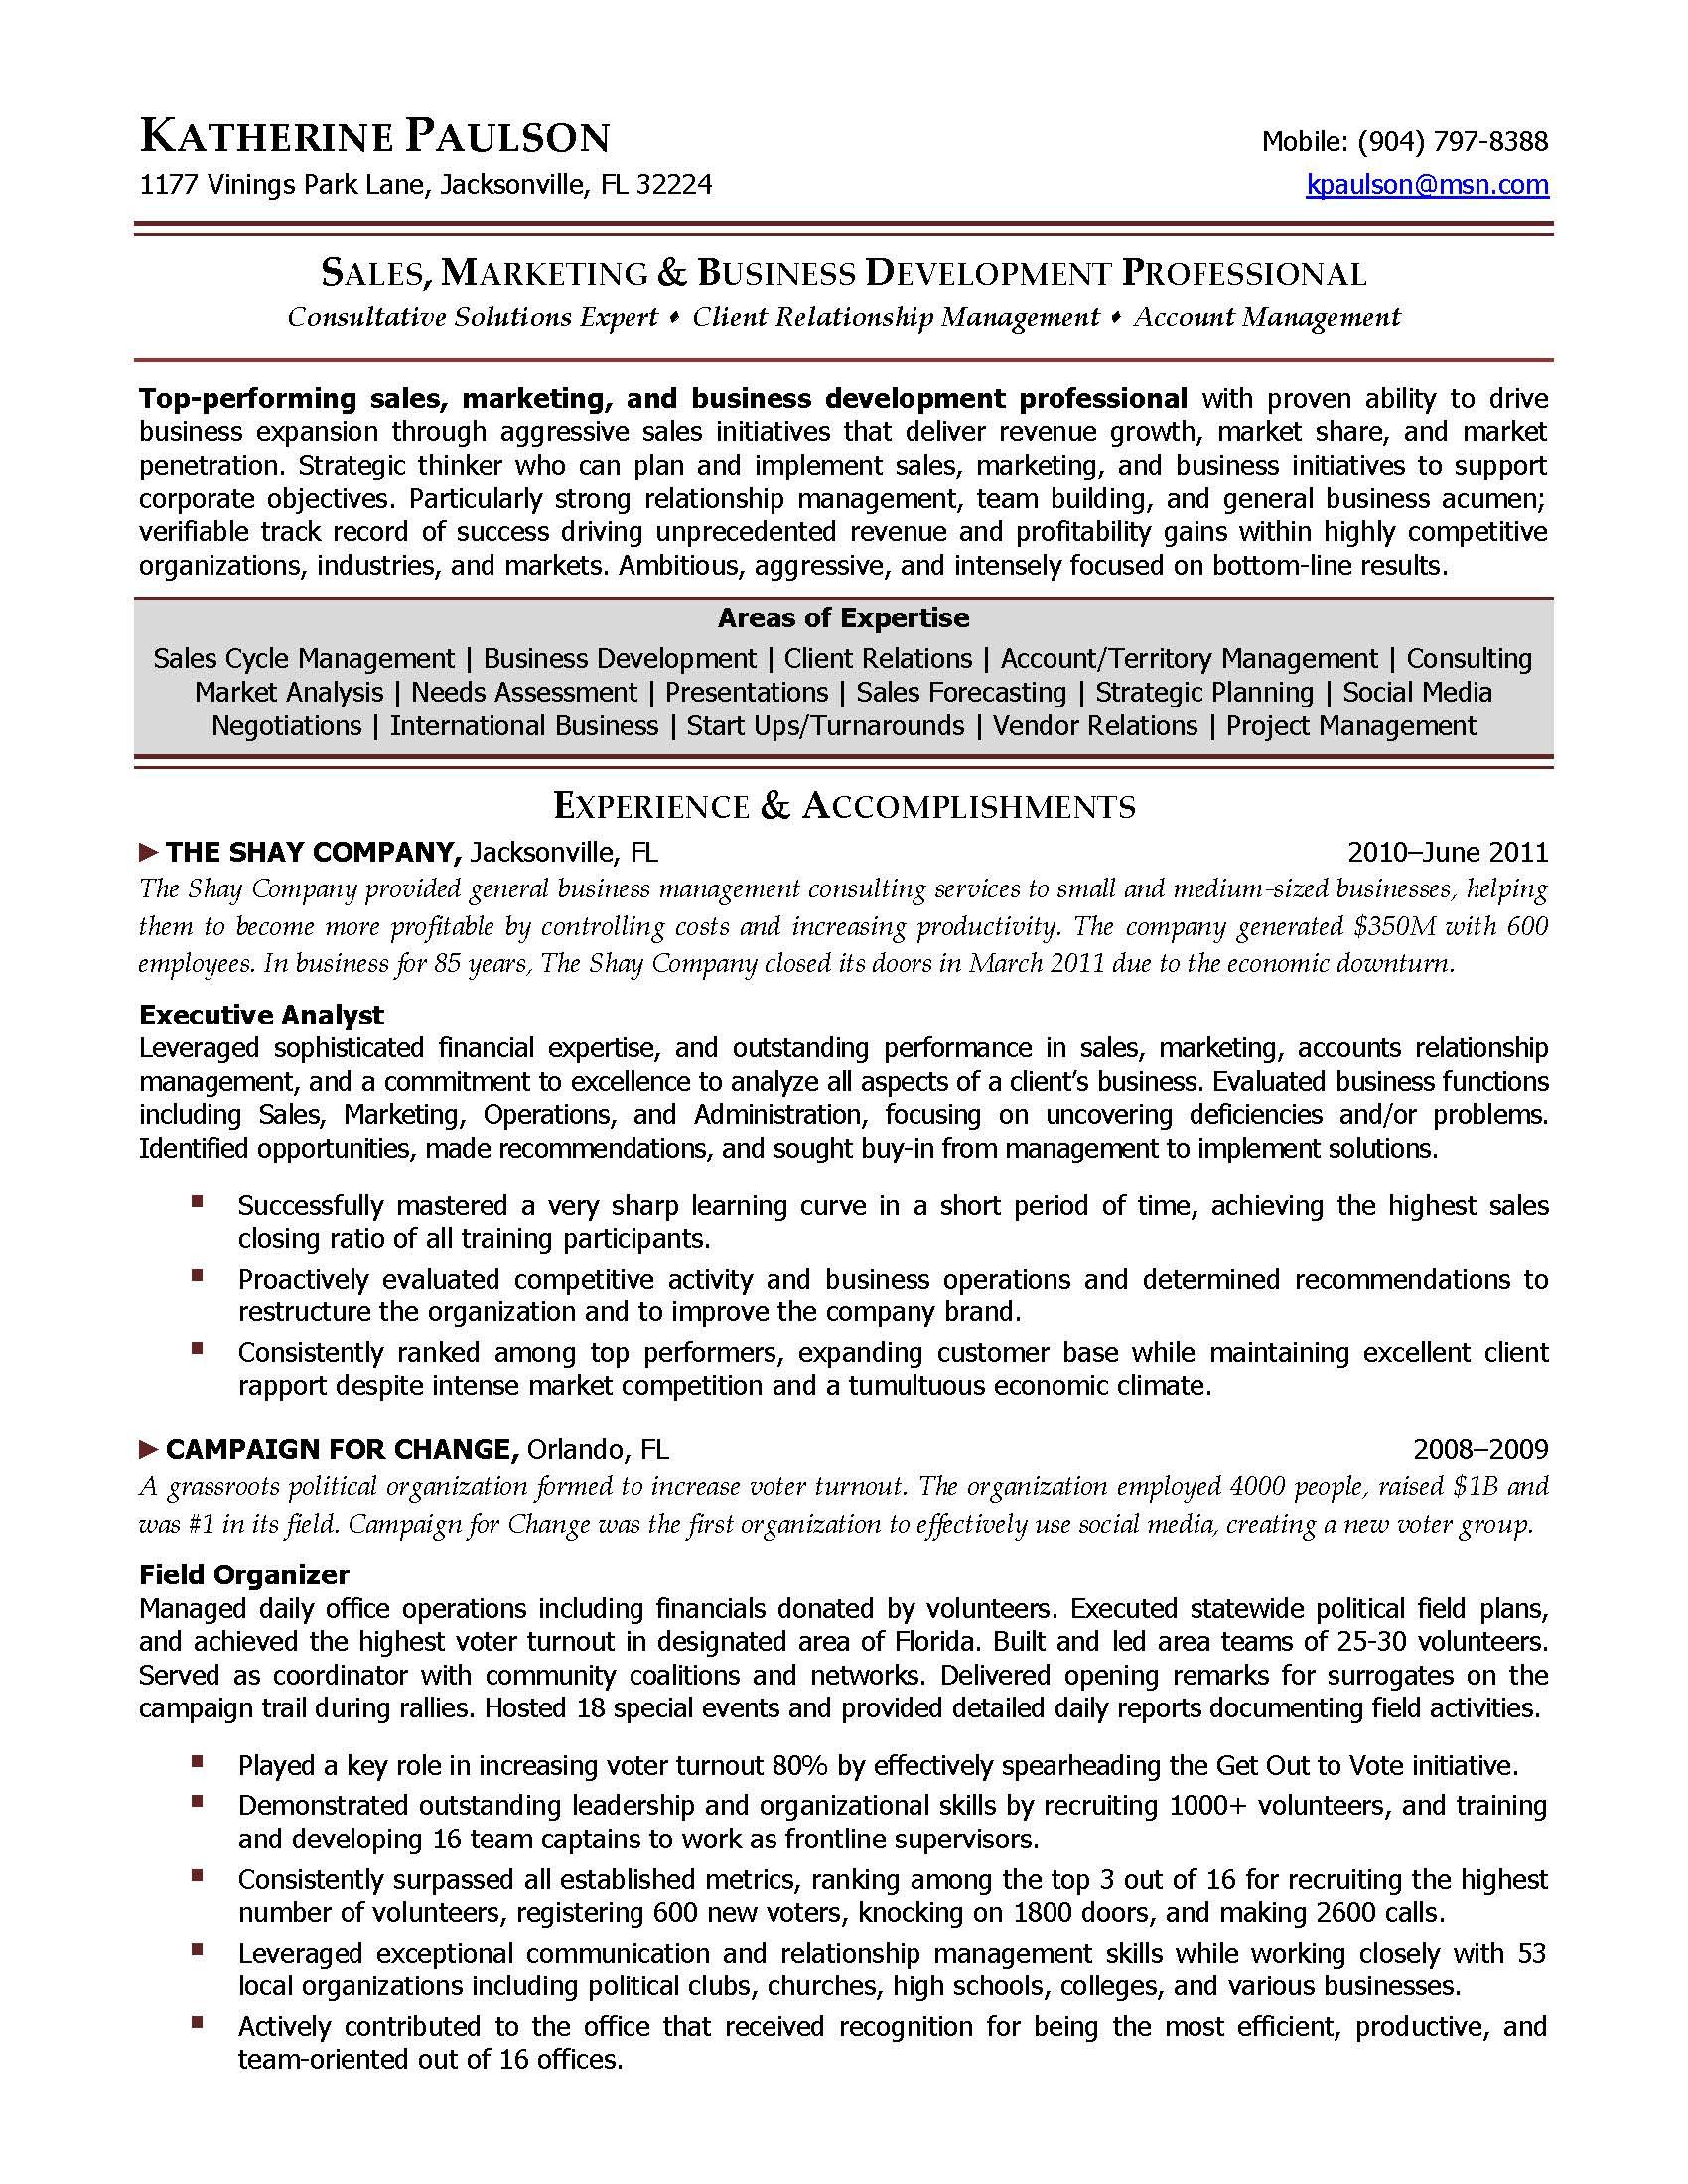 development director resume sample elite resume writing services